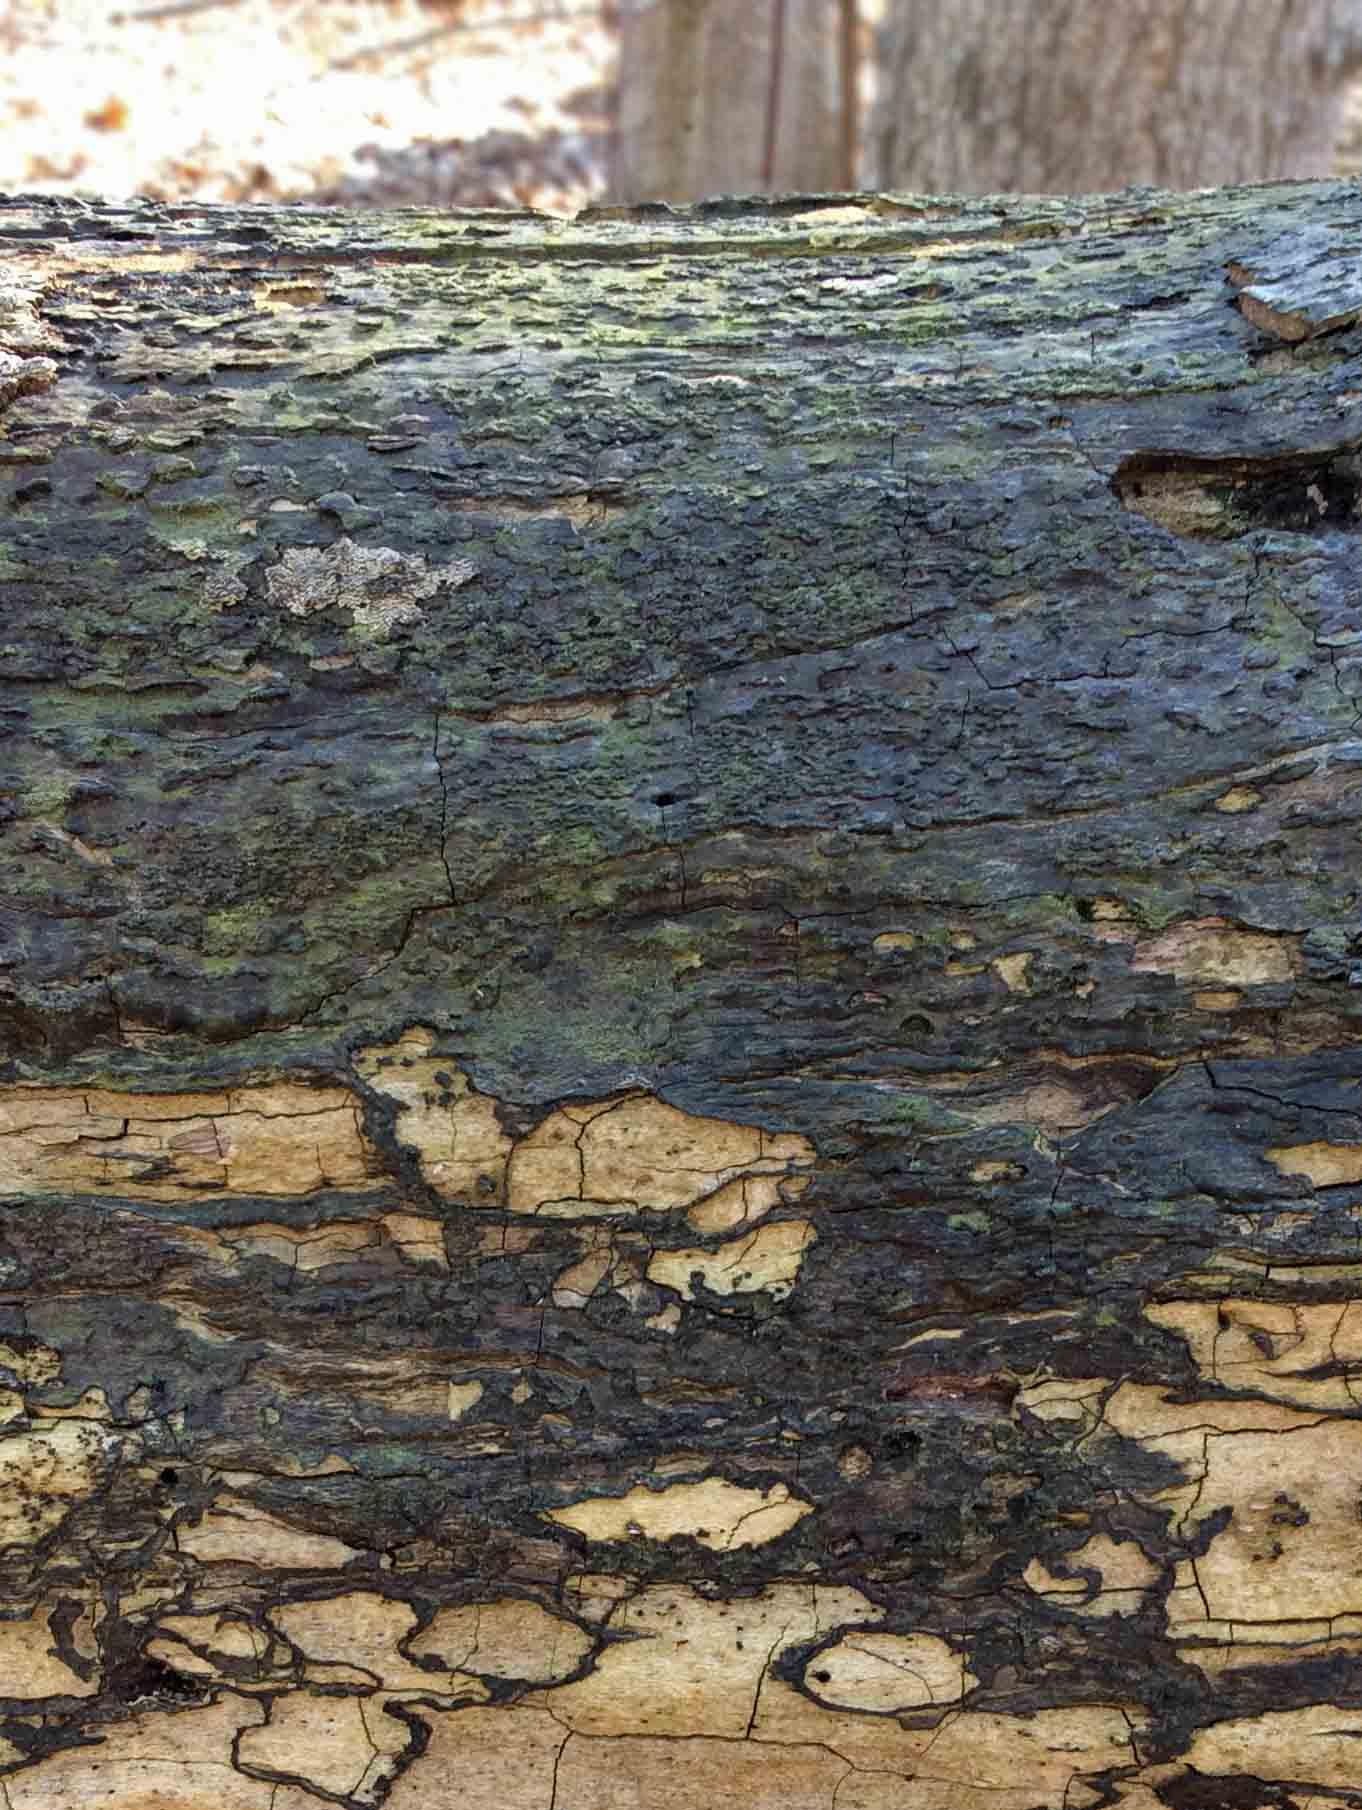 Blue-green fungus on log